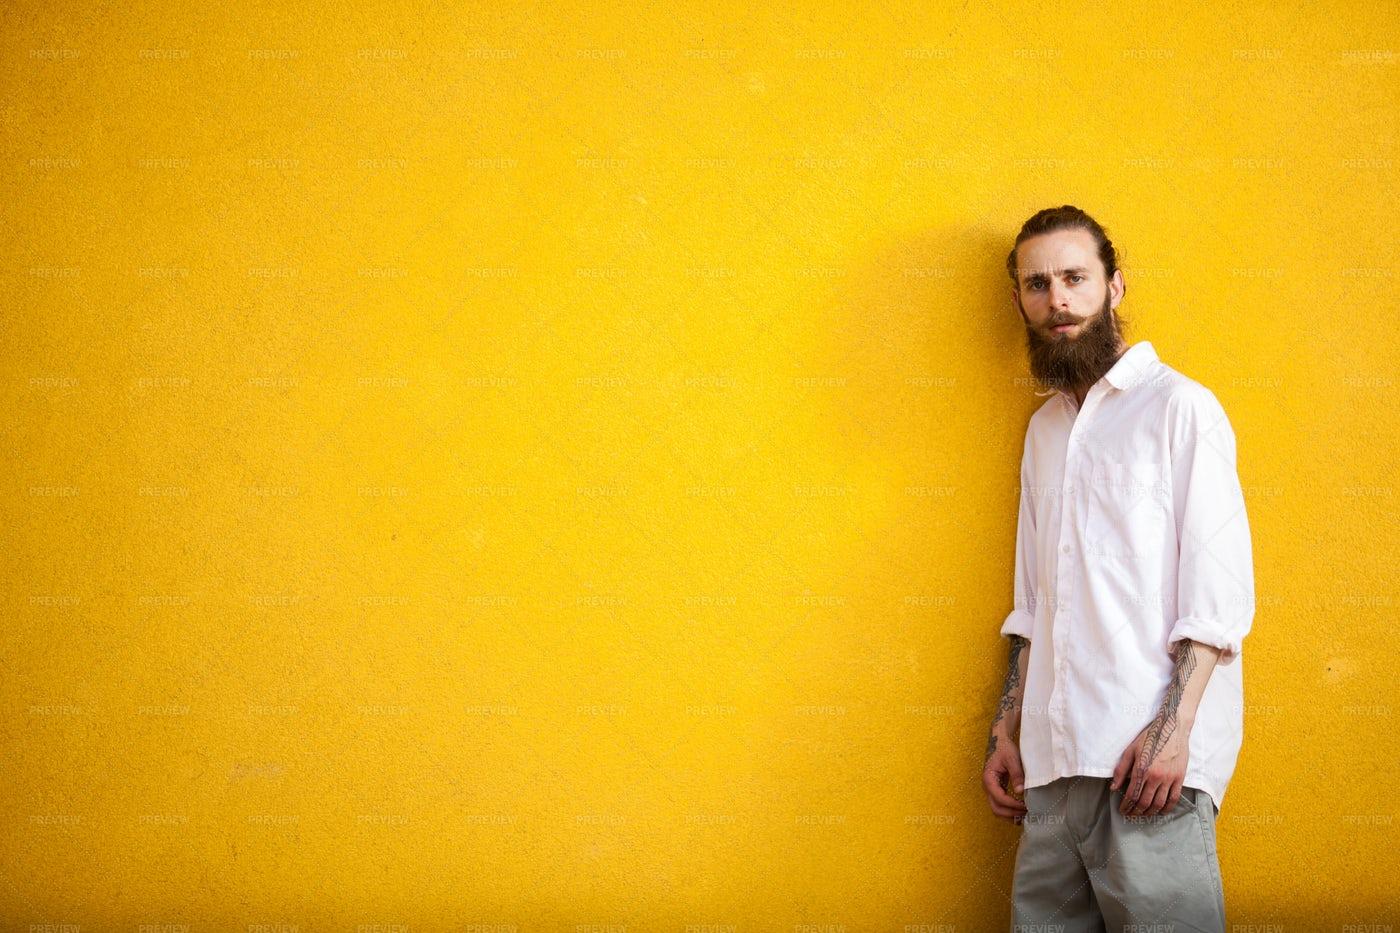 Tattooed Man Against Yellow Wall: Stock Photos